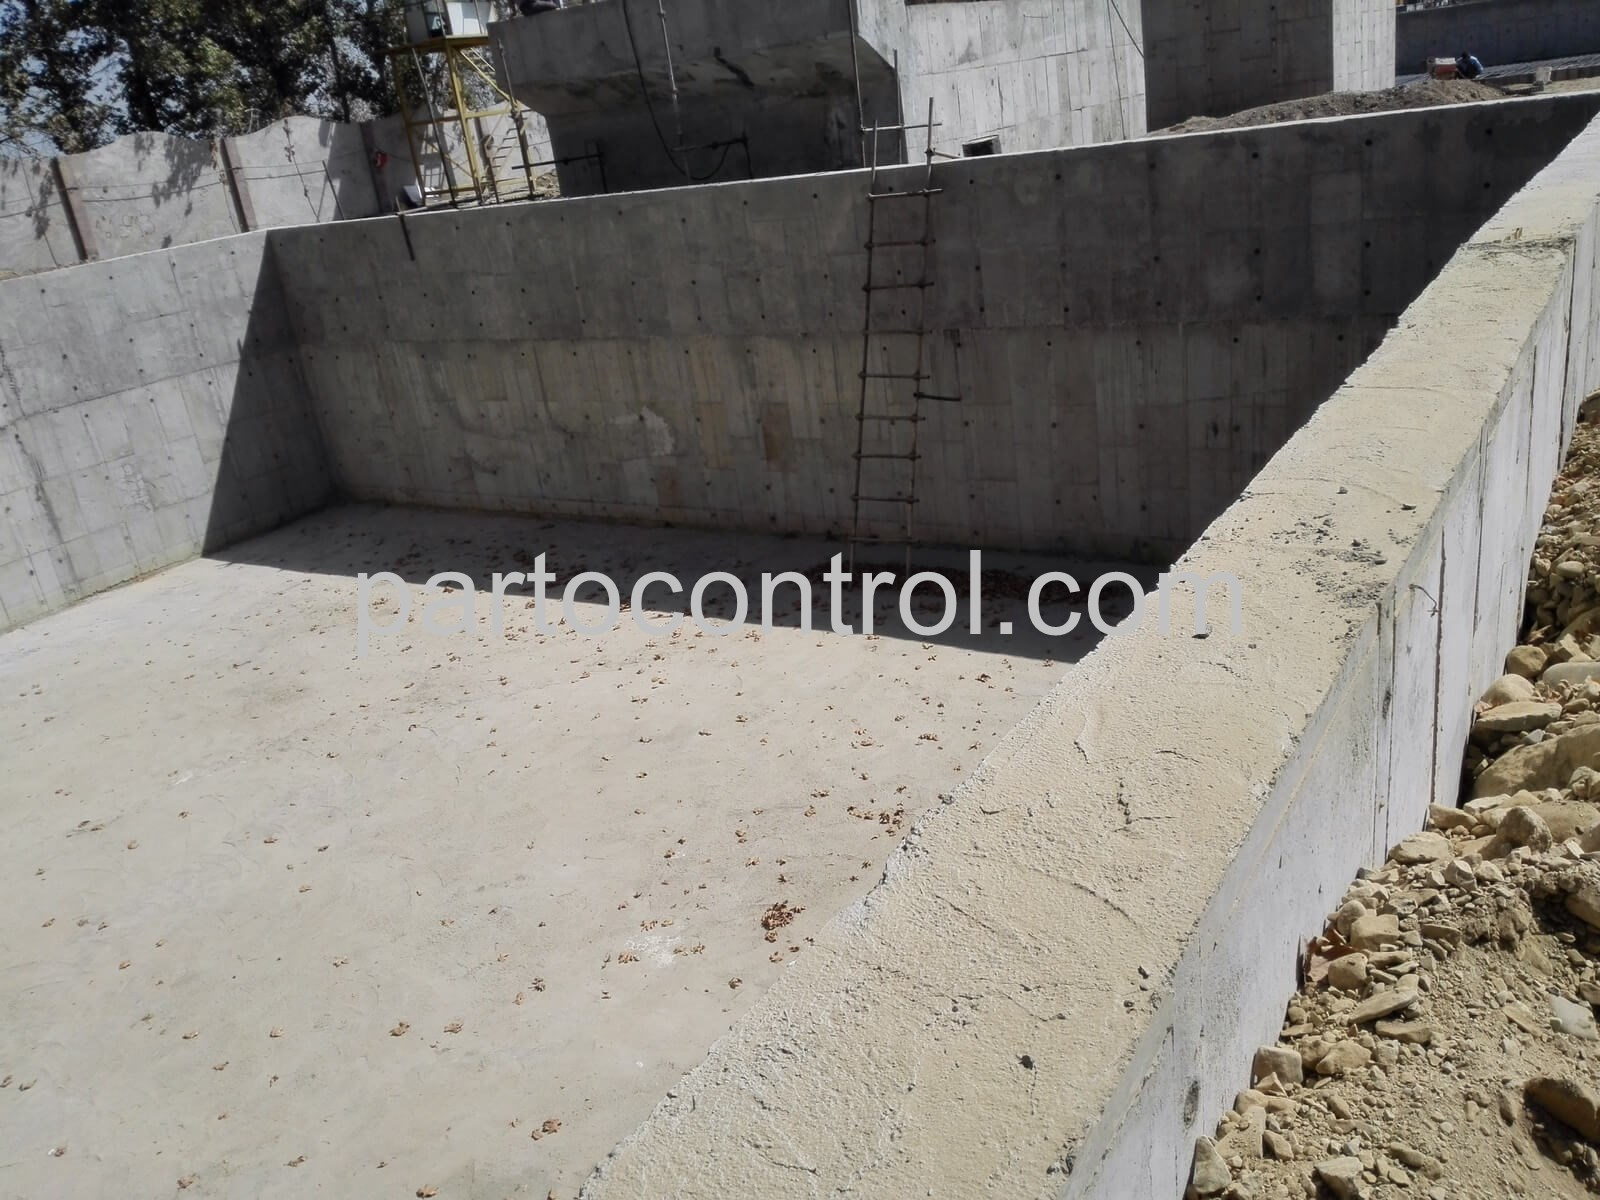 Concrete tanks in Kaleh مخازن بتنی کاله 2 - پروژه مخازن بتنی